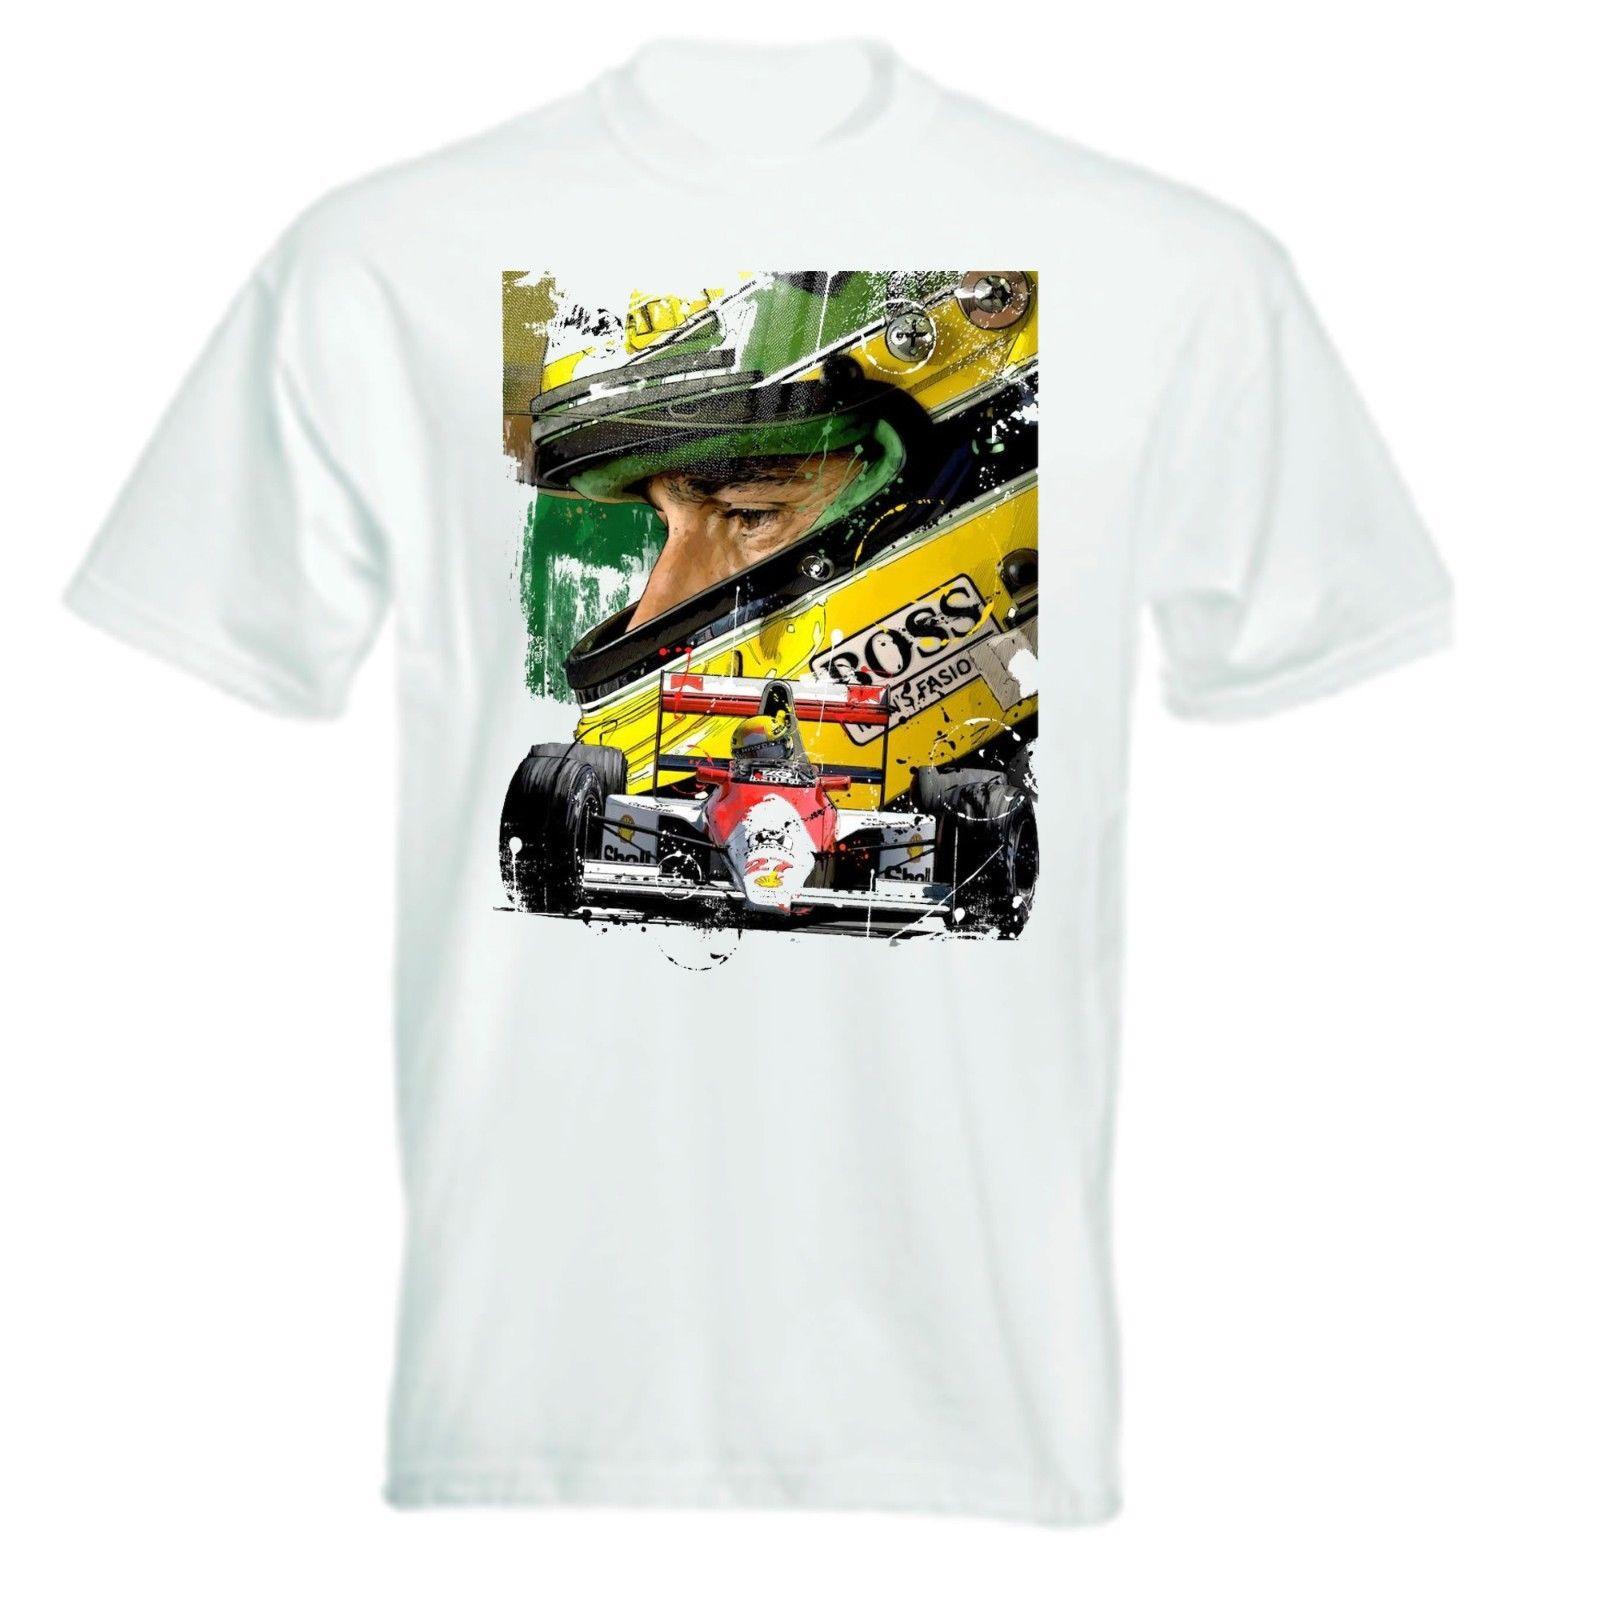 ayrton-font-b-senna-b-font-artwork-t-shirt-tees-brand-clothing-funny-t-shirt-top-tee-male-battery-funny-cotton-tops-basic-tops